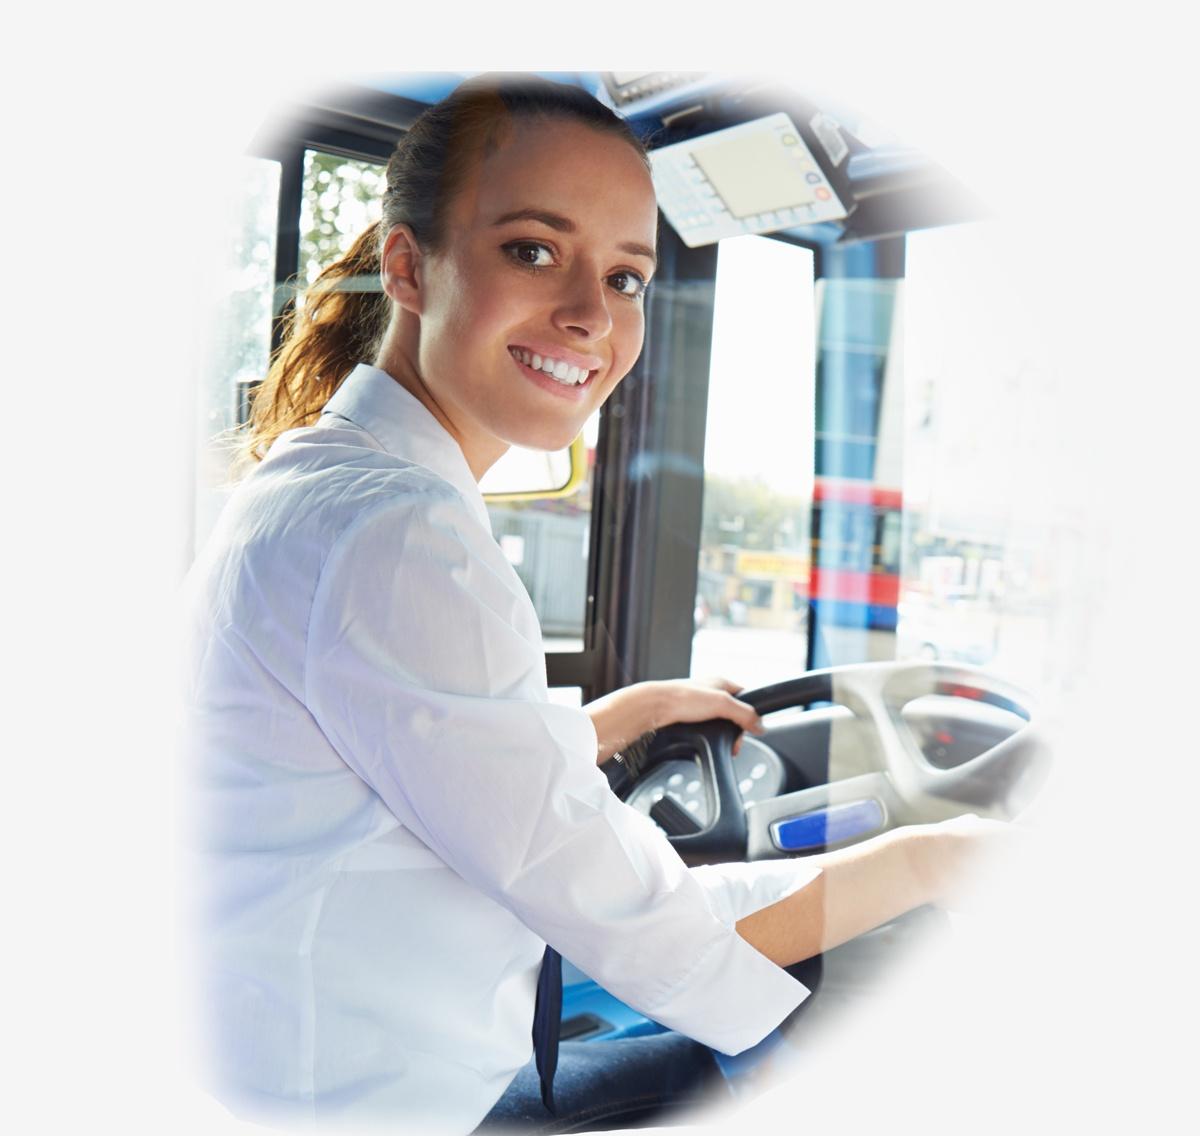 Bus_driver.jpg